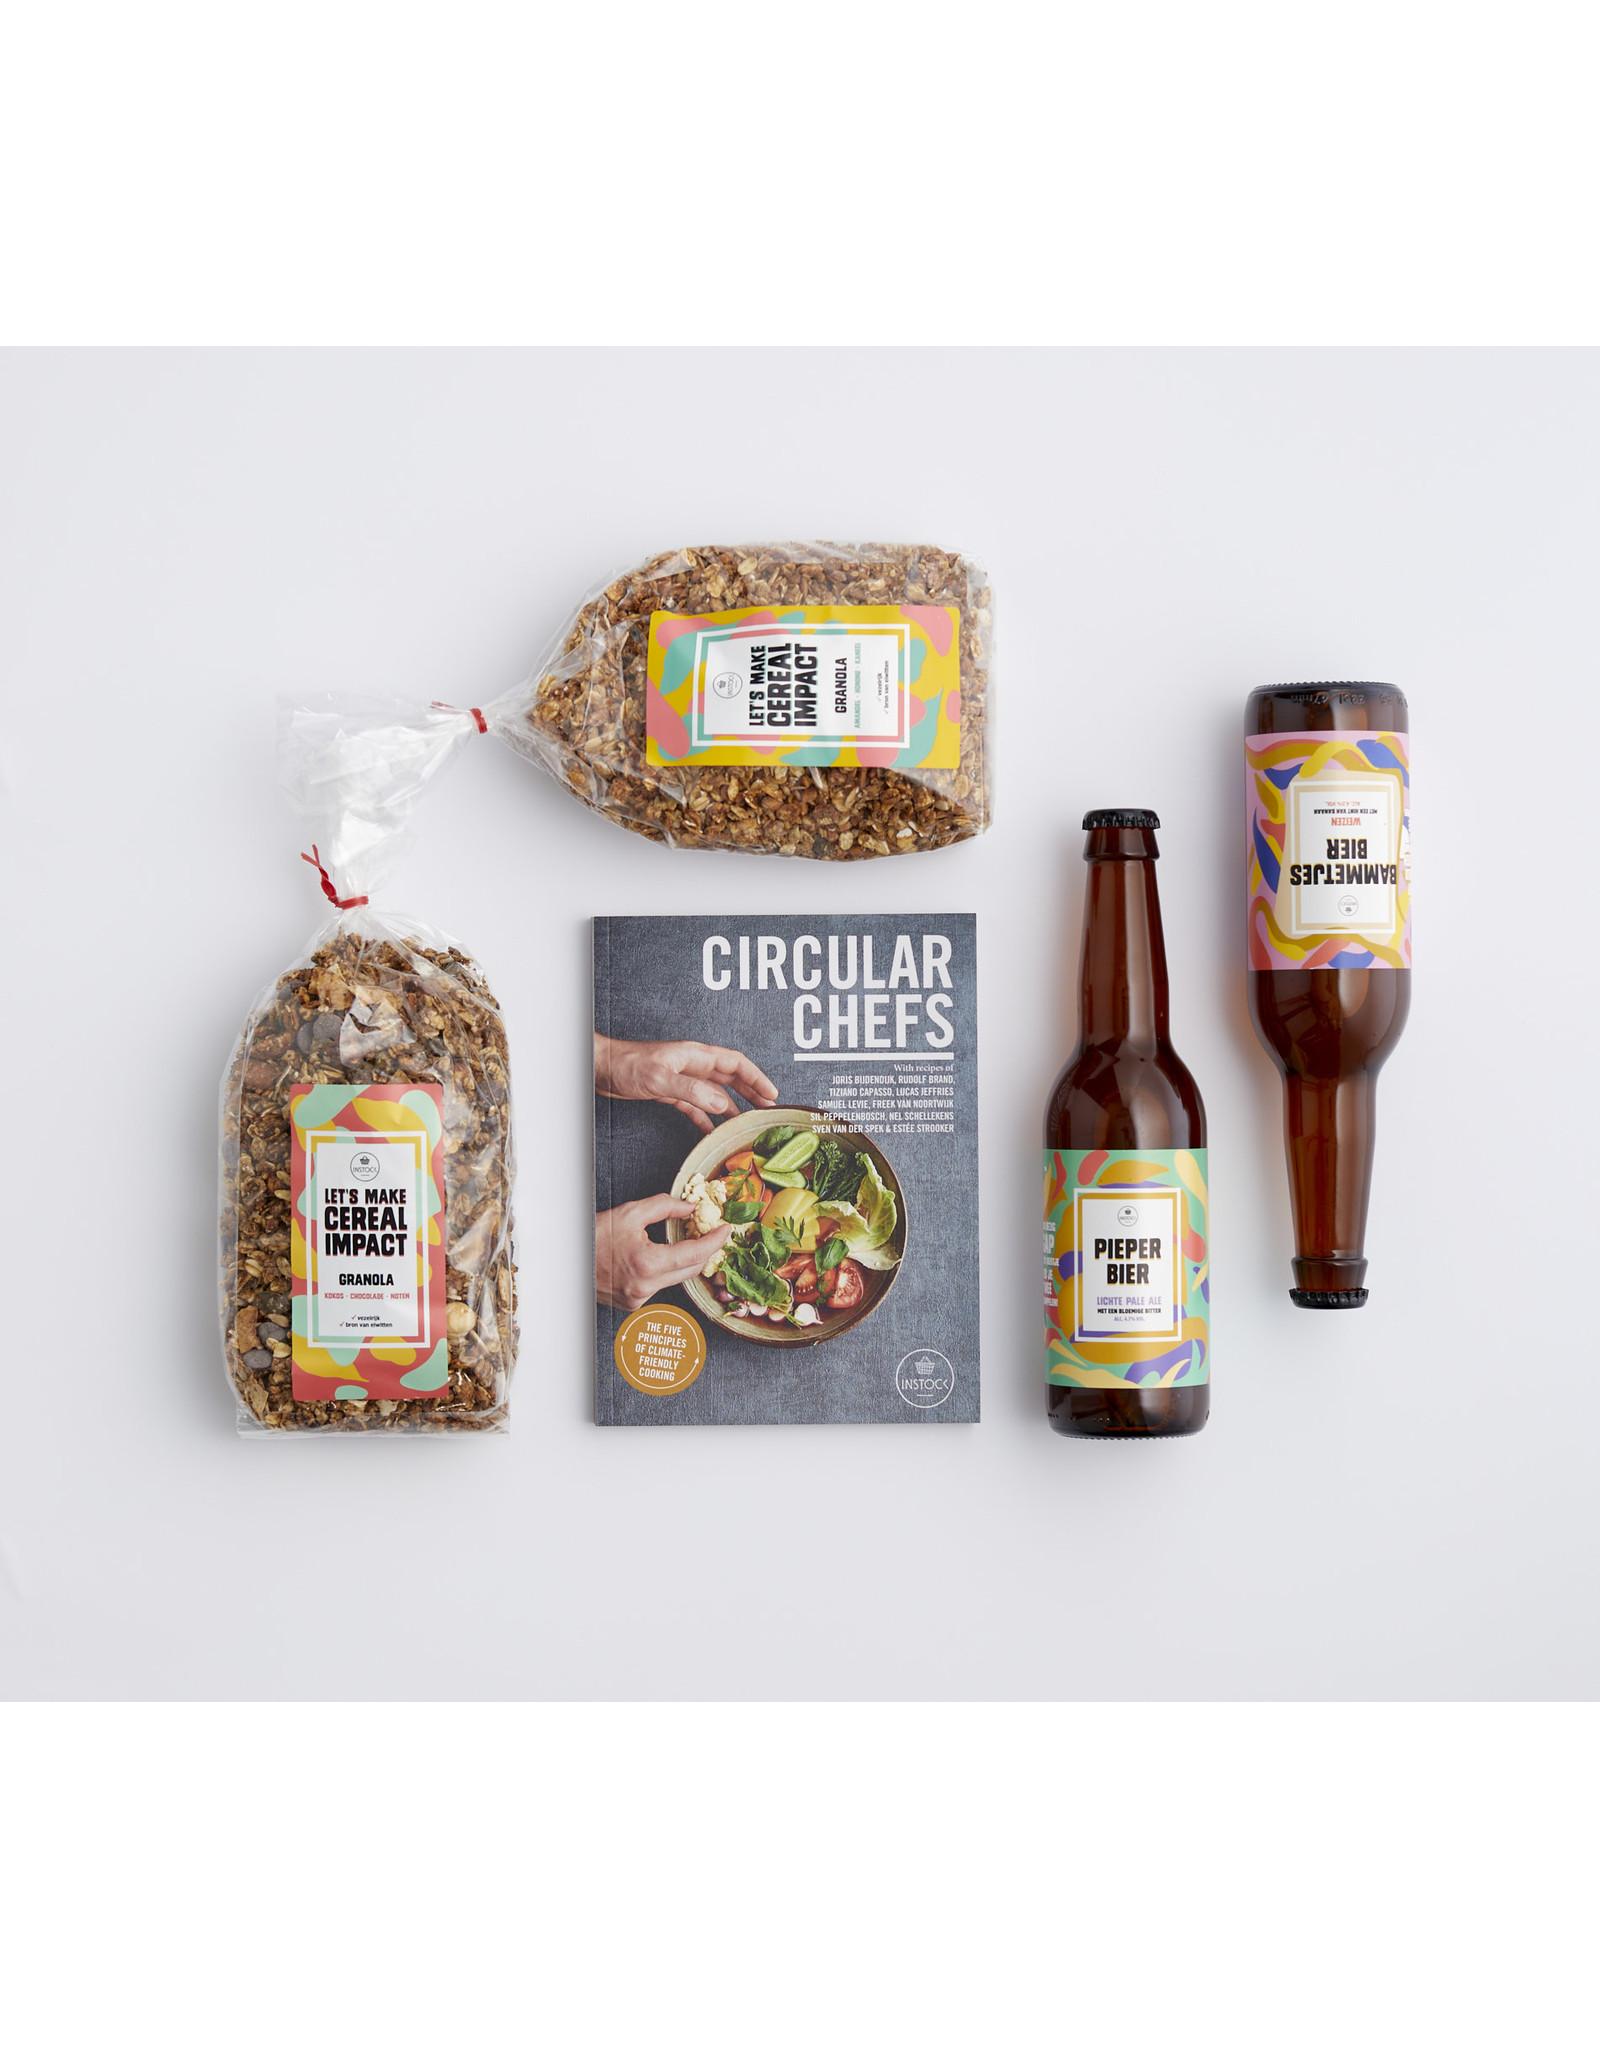 Instock Product Box - Medium